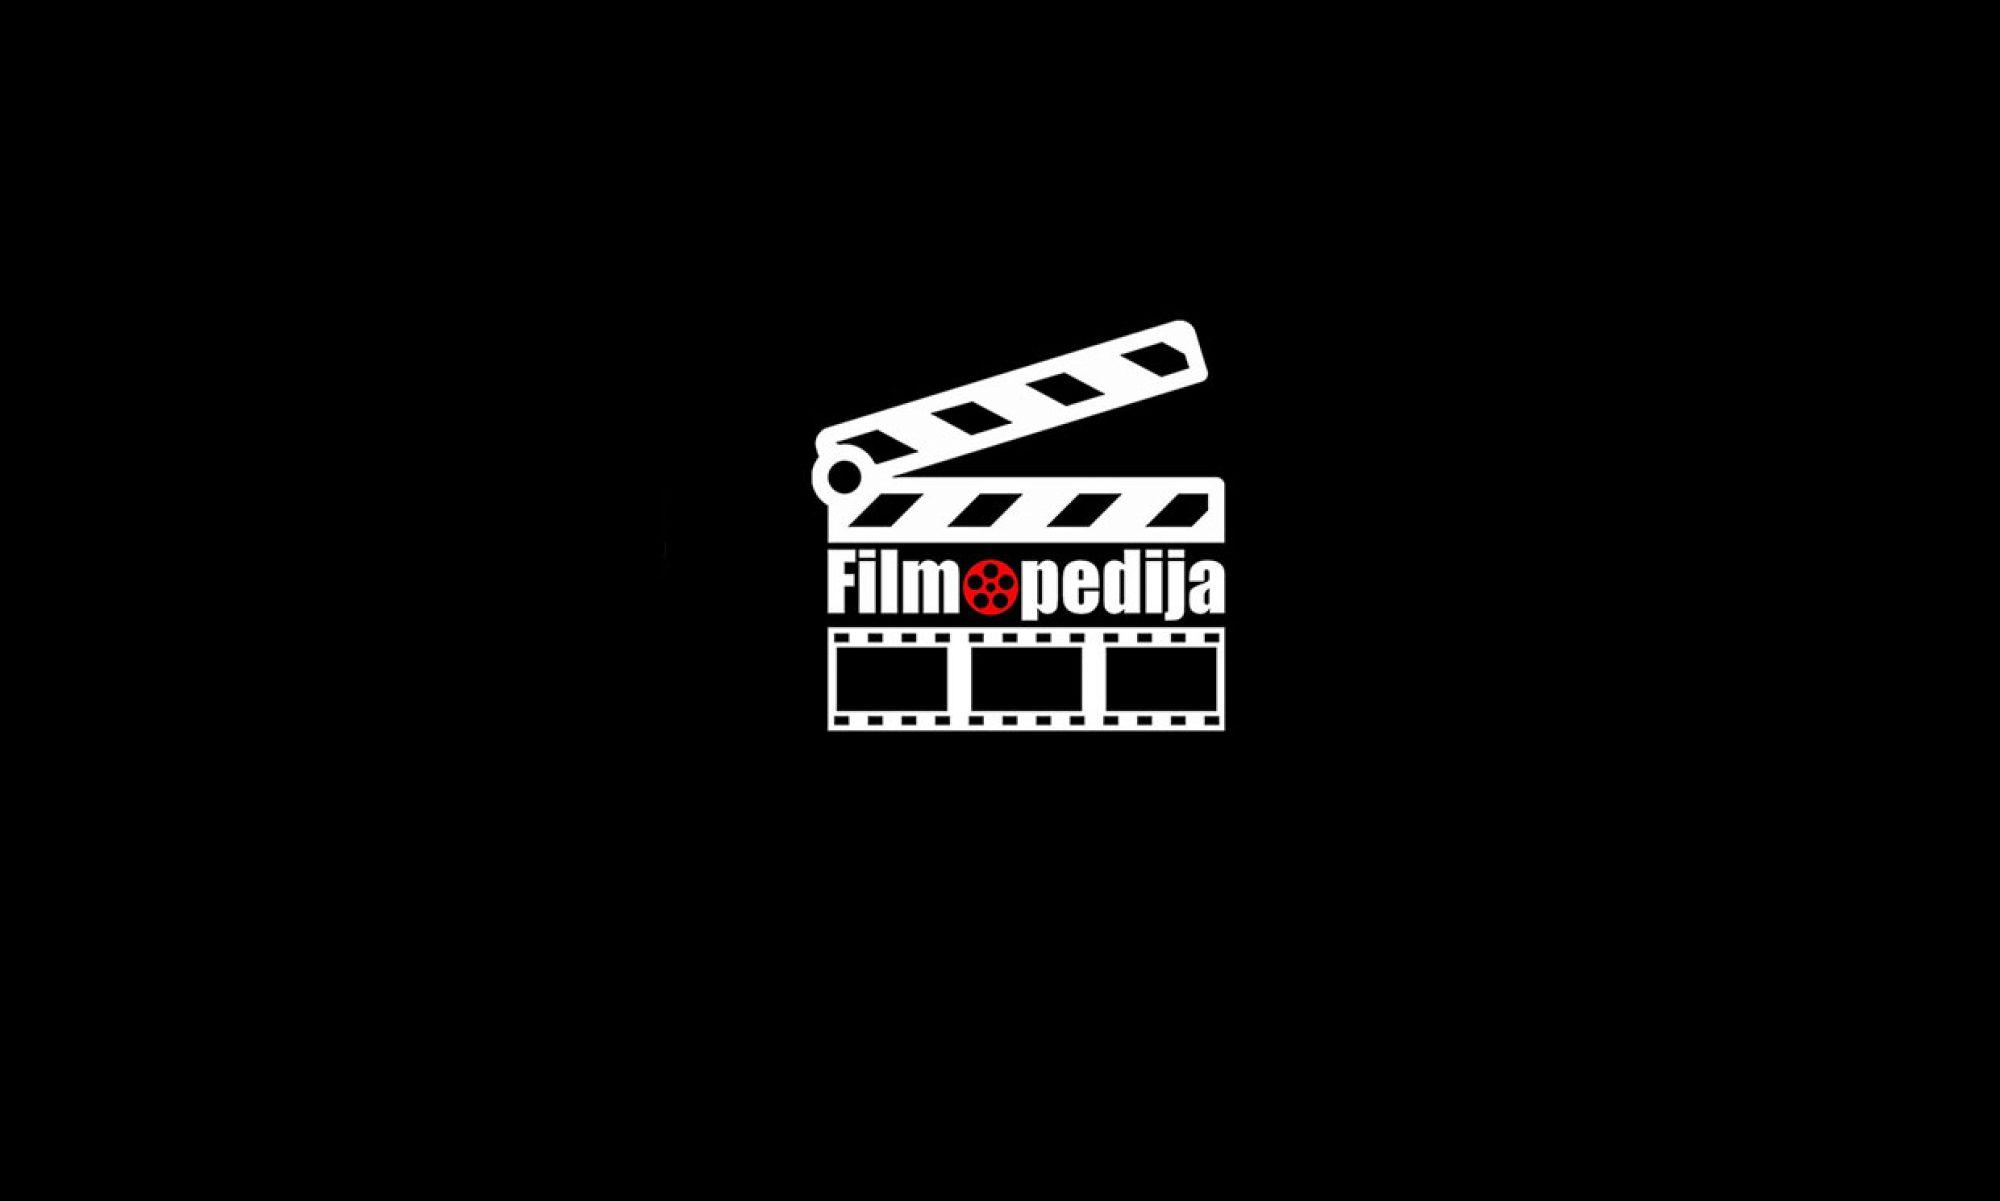 Filmopedija